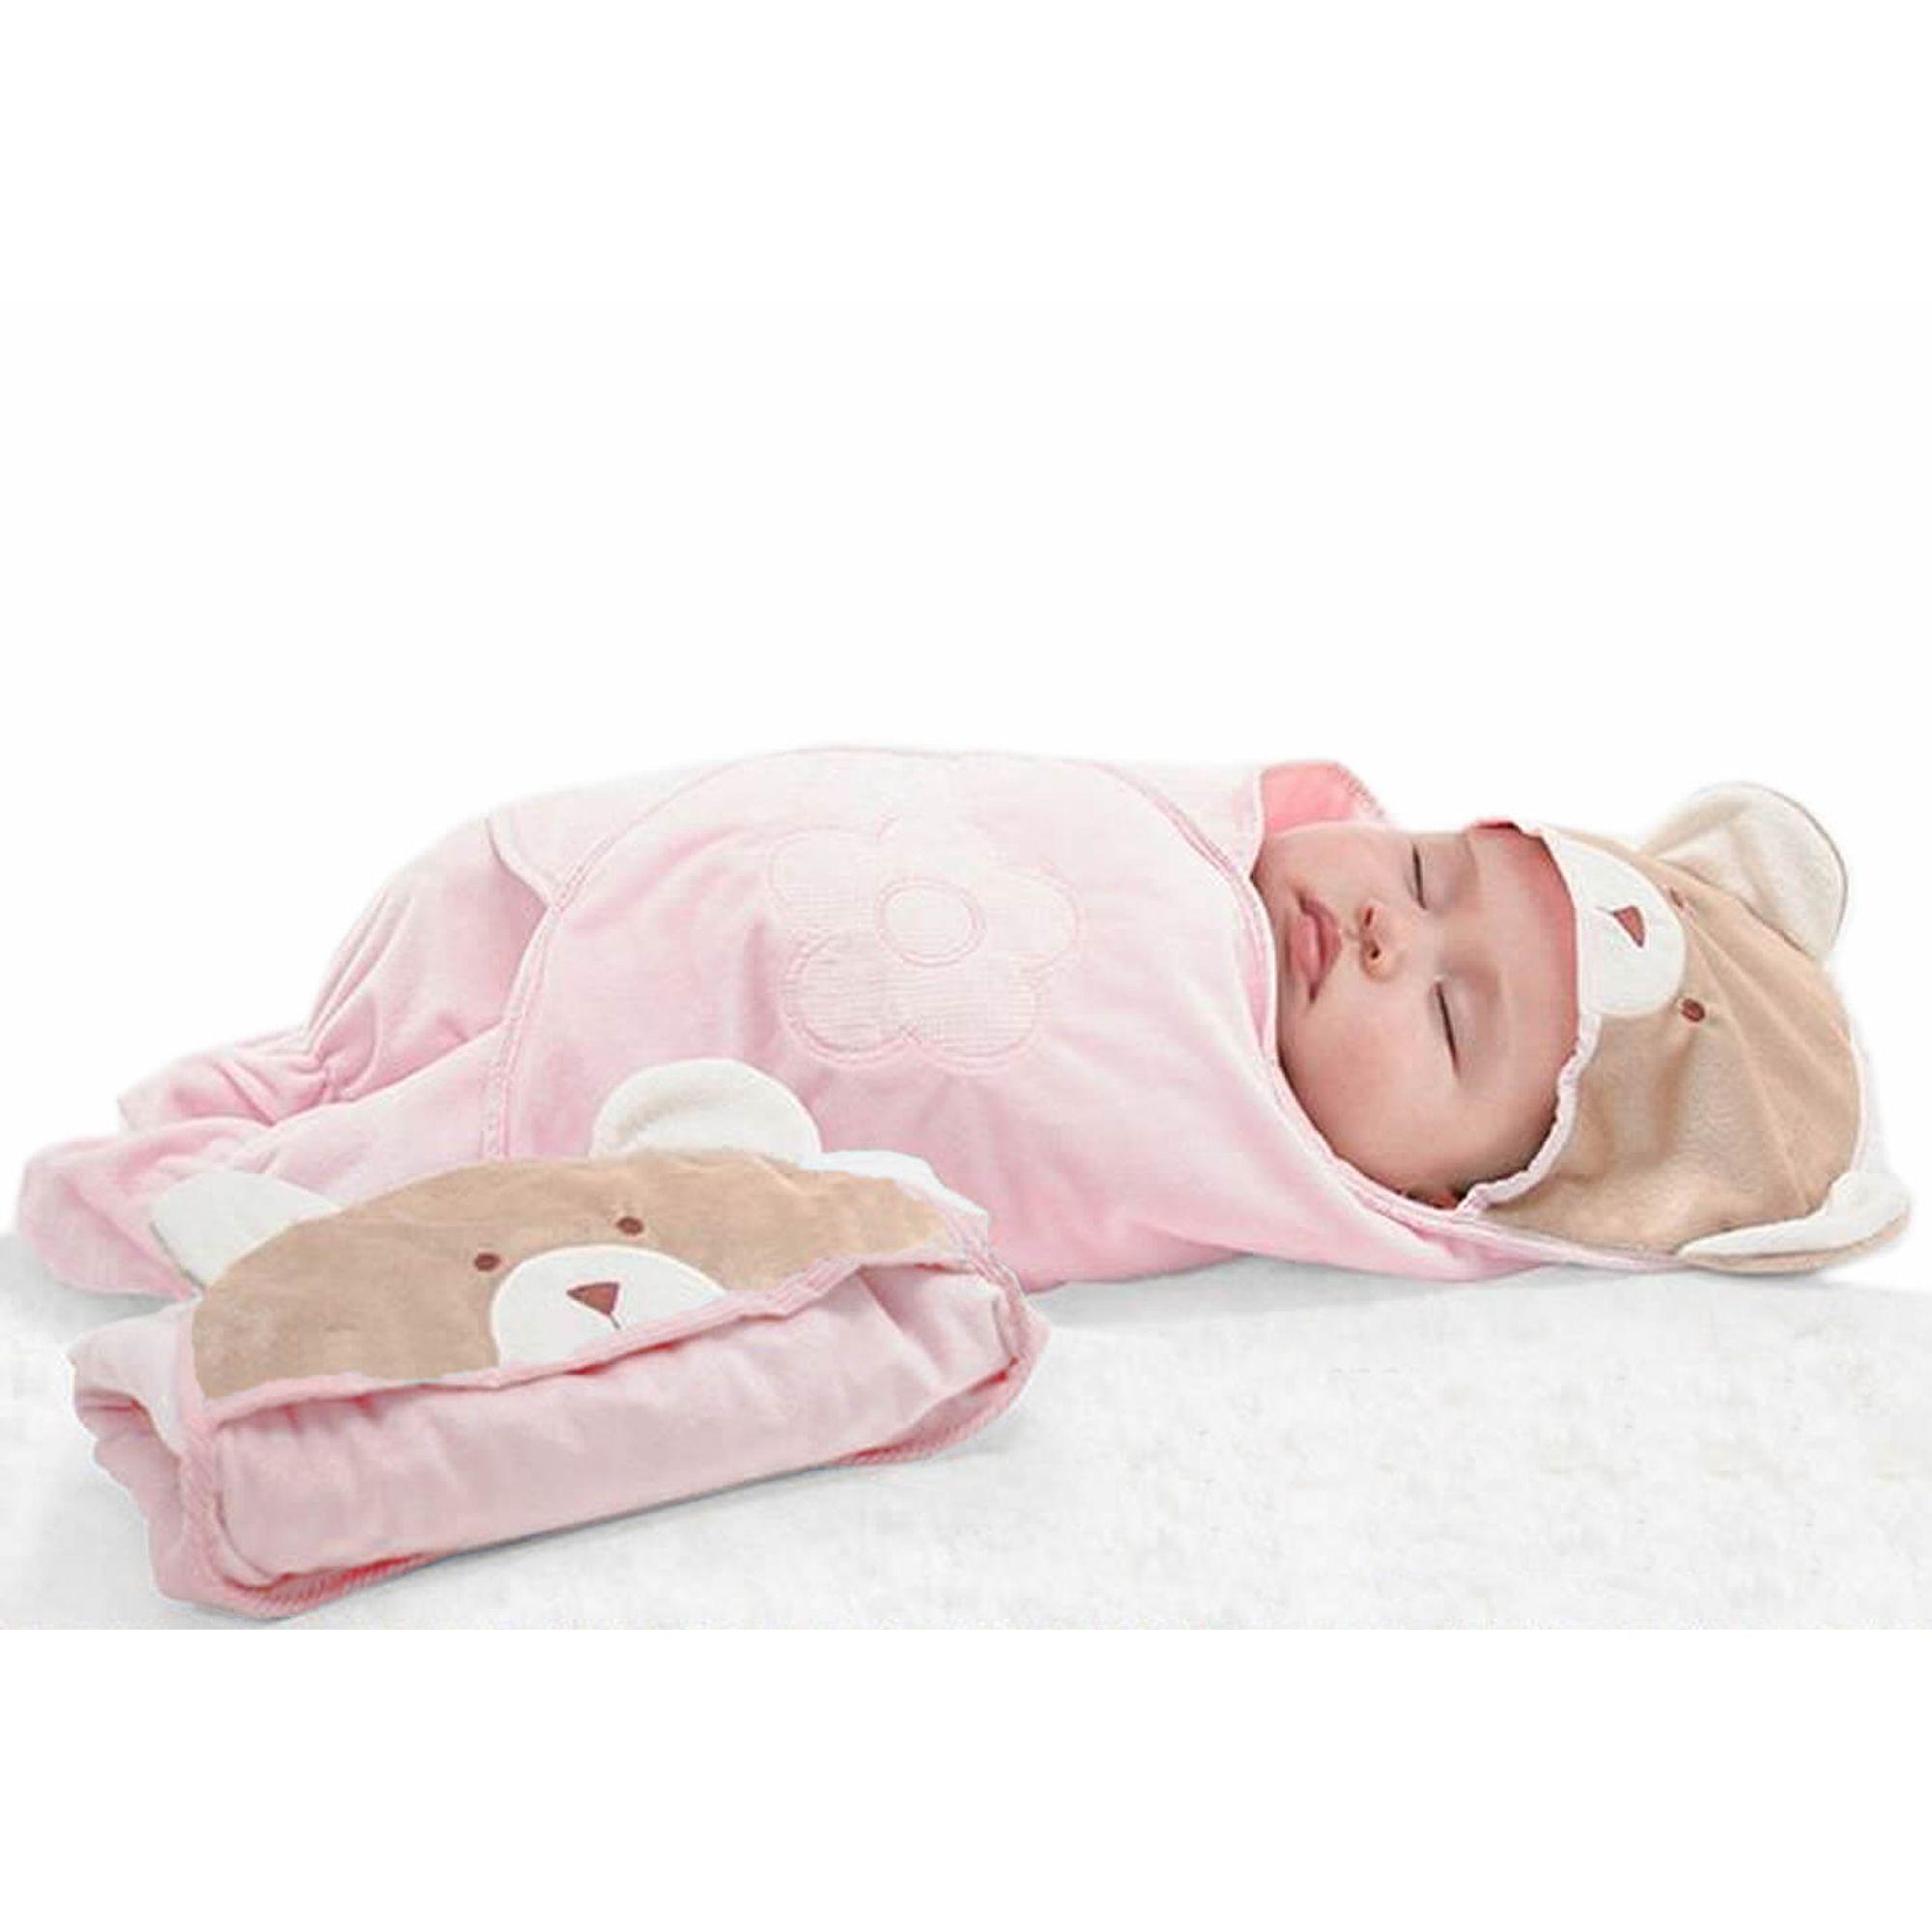 cueiro-swaddle-urso-nino-rosa-zip-toys